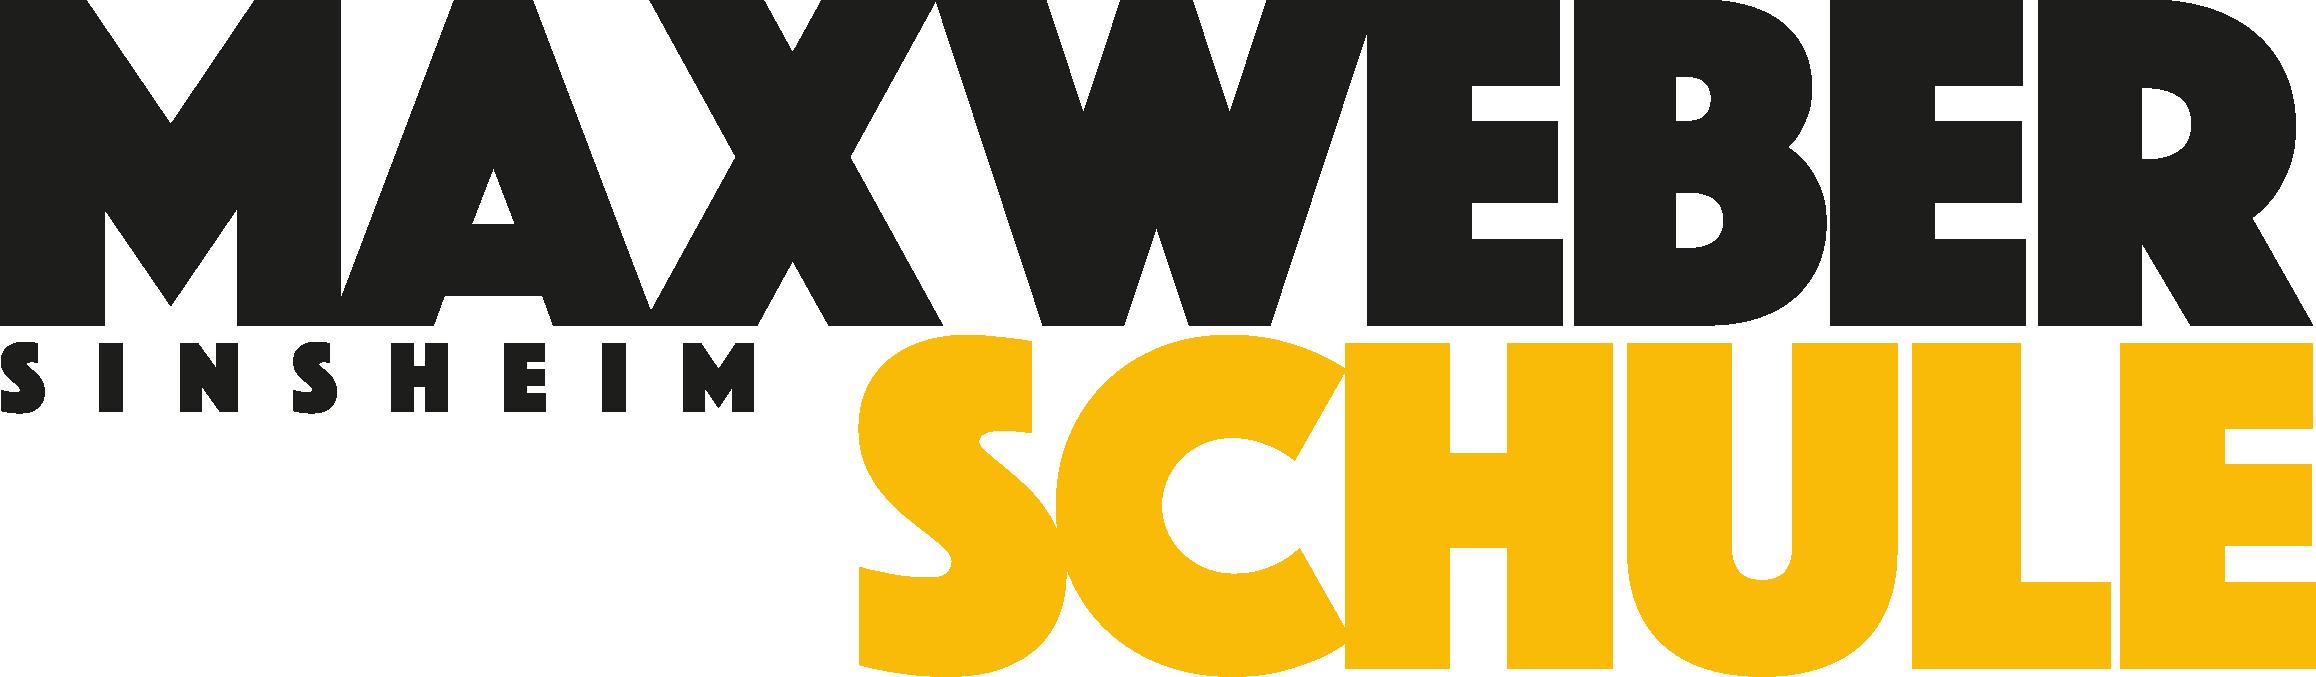 Max-Weber-Schule in Sinsheim